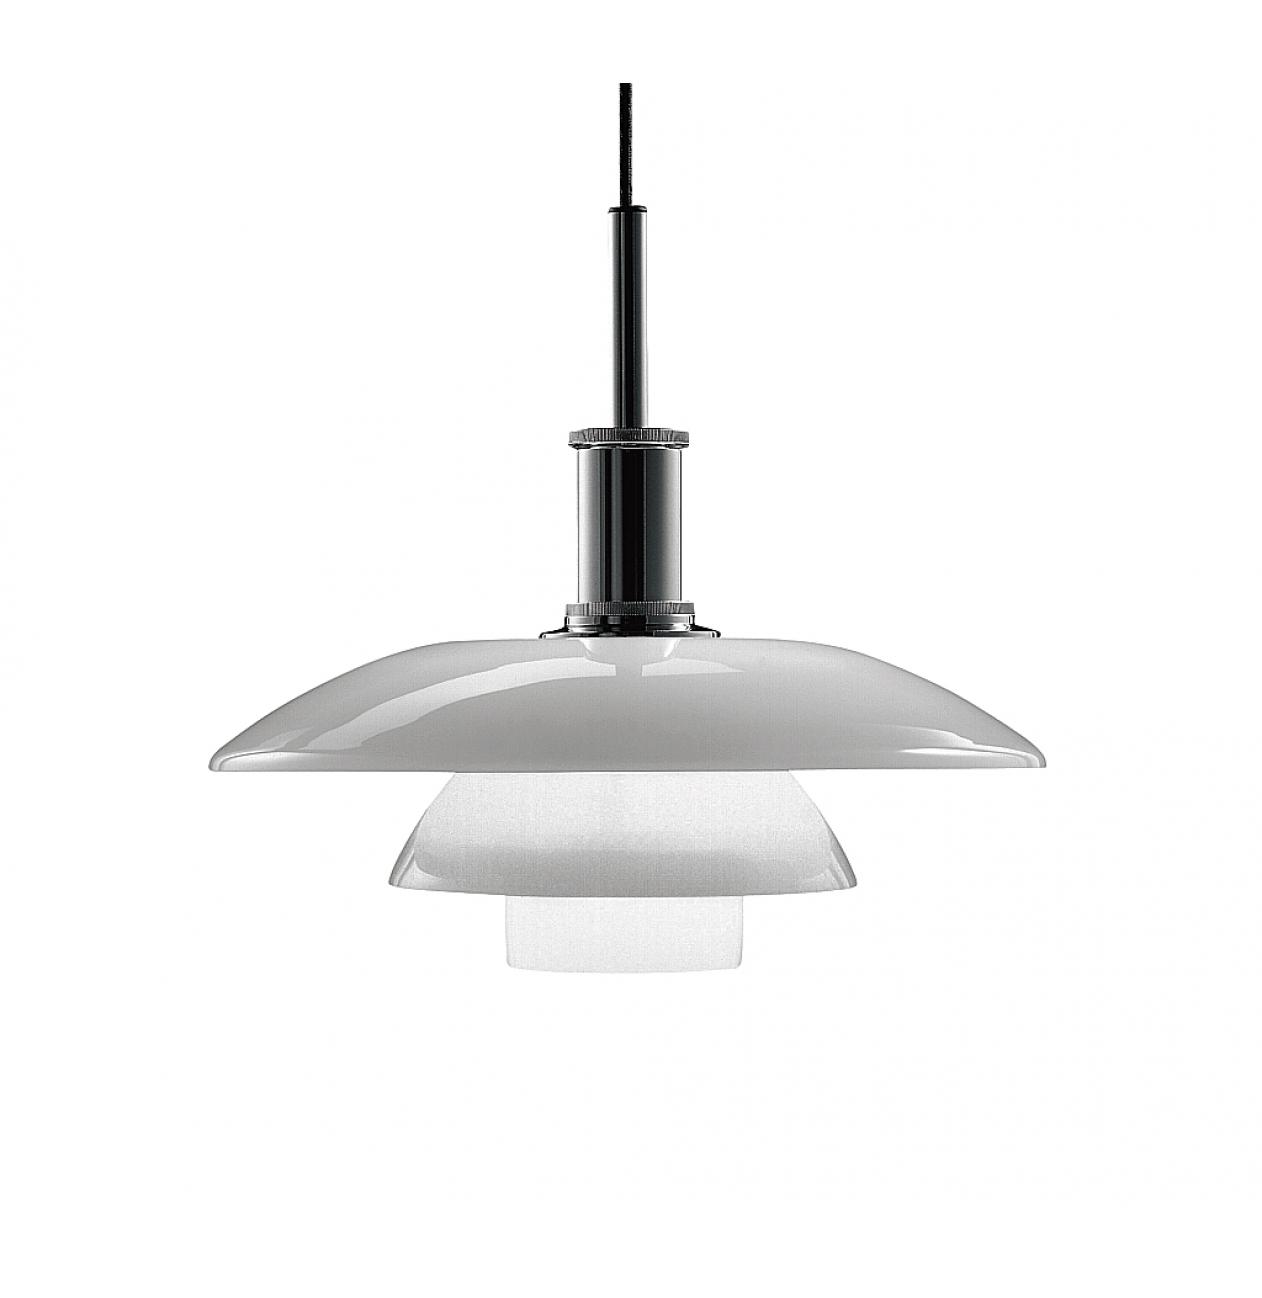 louis poulsen hanglamp ph 4 5 4 glas versteeg lichtstudio. Black Bedroom Furniture Sets. Home Design Ideas